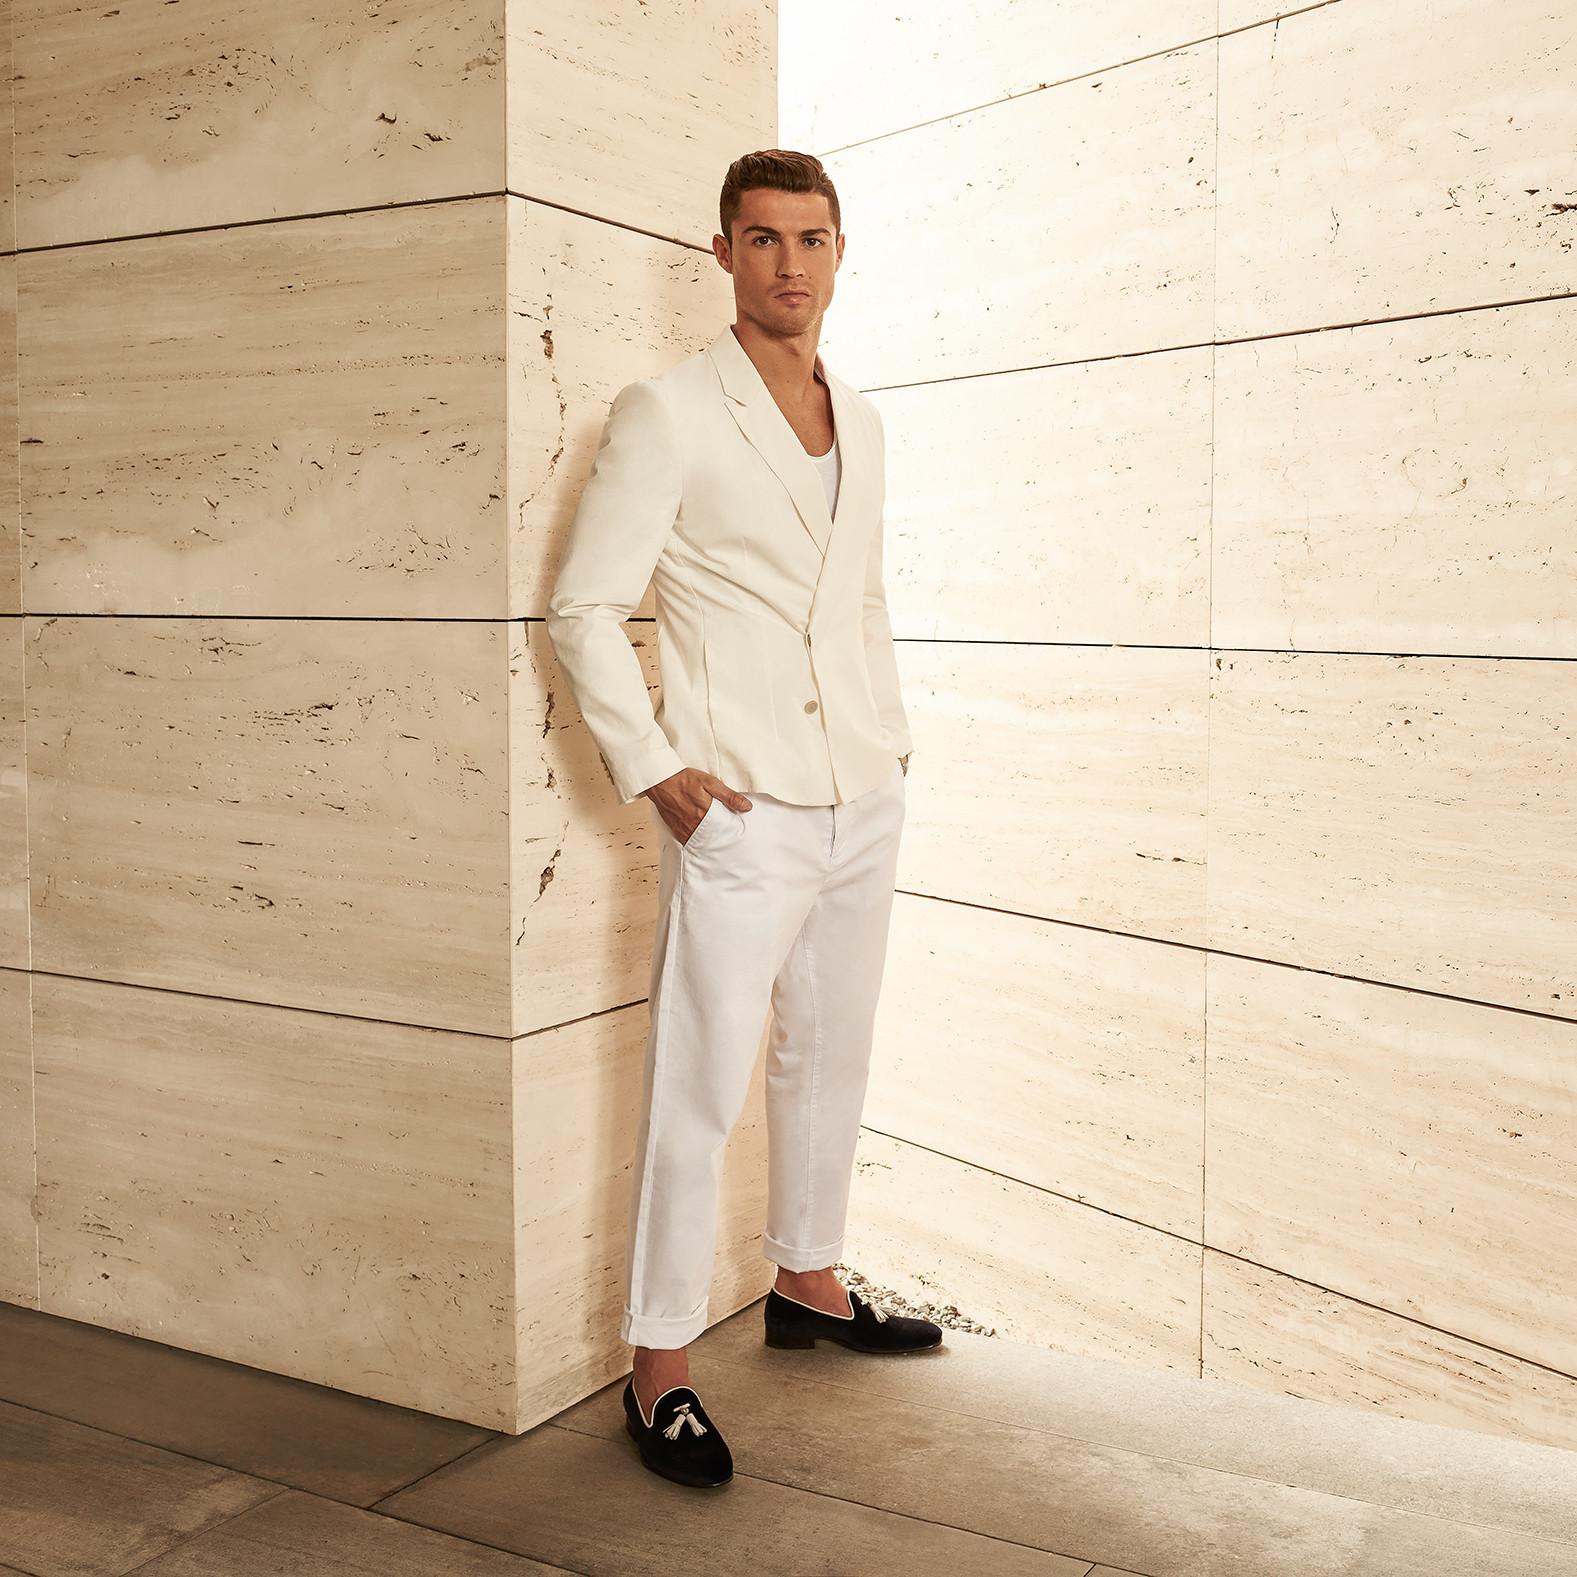 Cristiano Ronaldo-Outfit